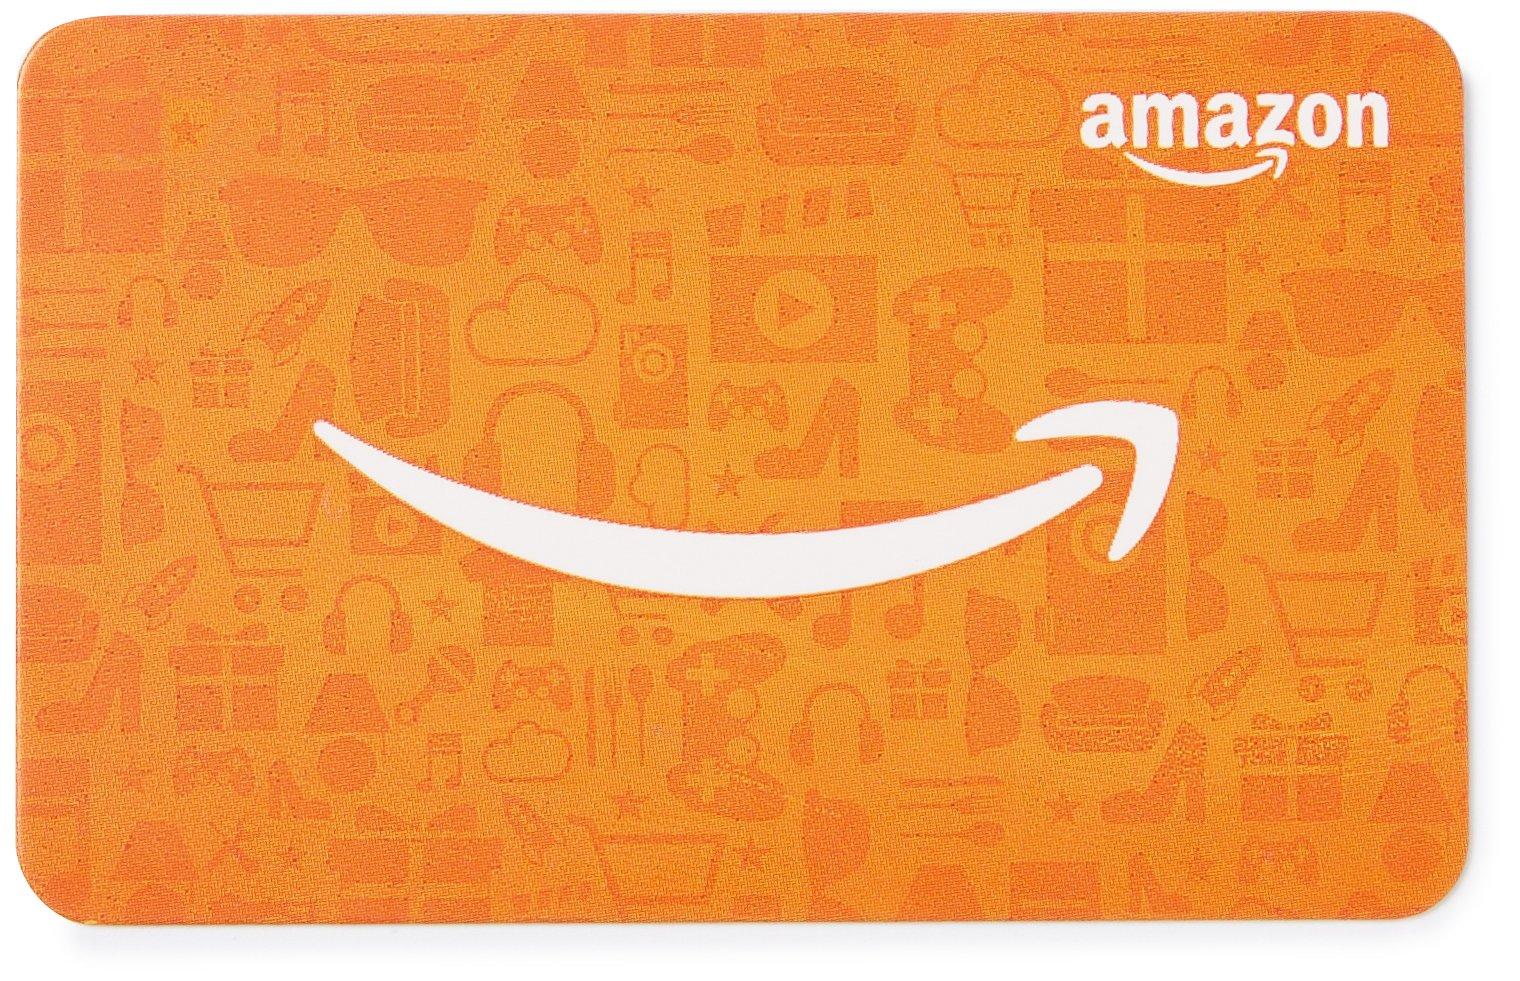 Amazon Store Card